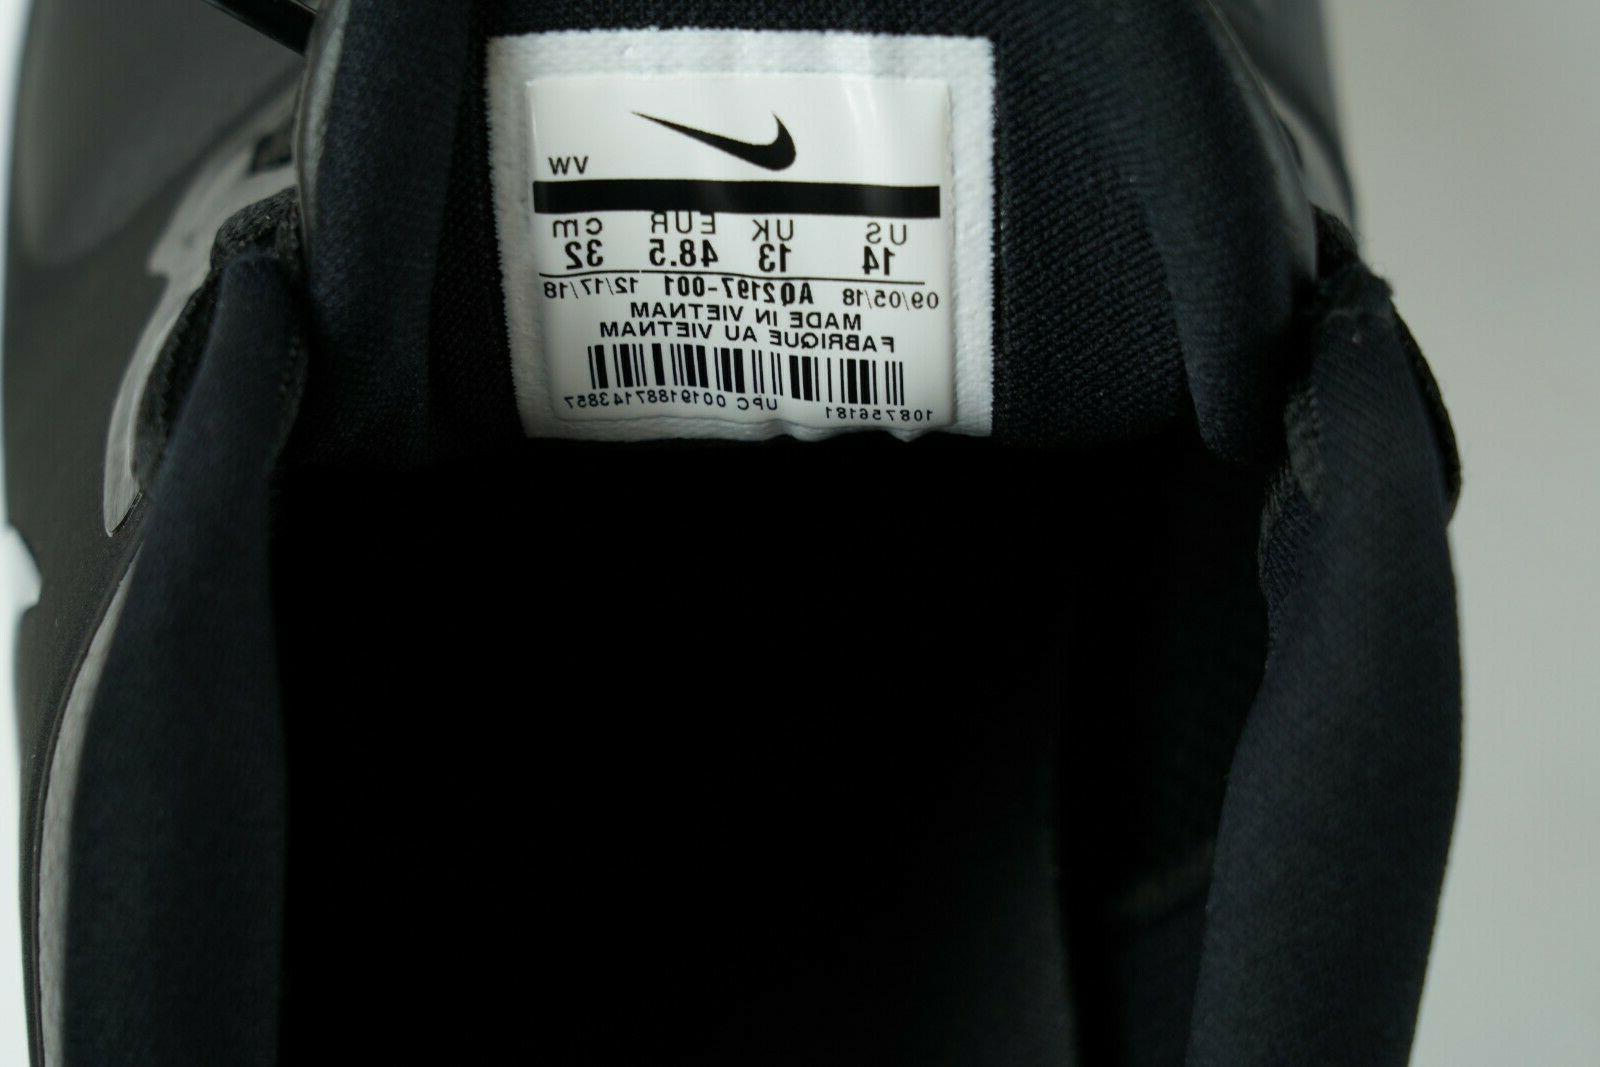 Nike Vapor Shoes Waterproof Black AQ2197-001 Size